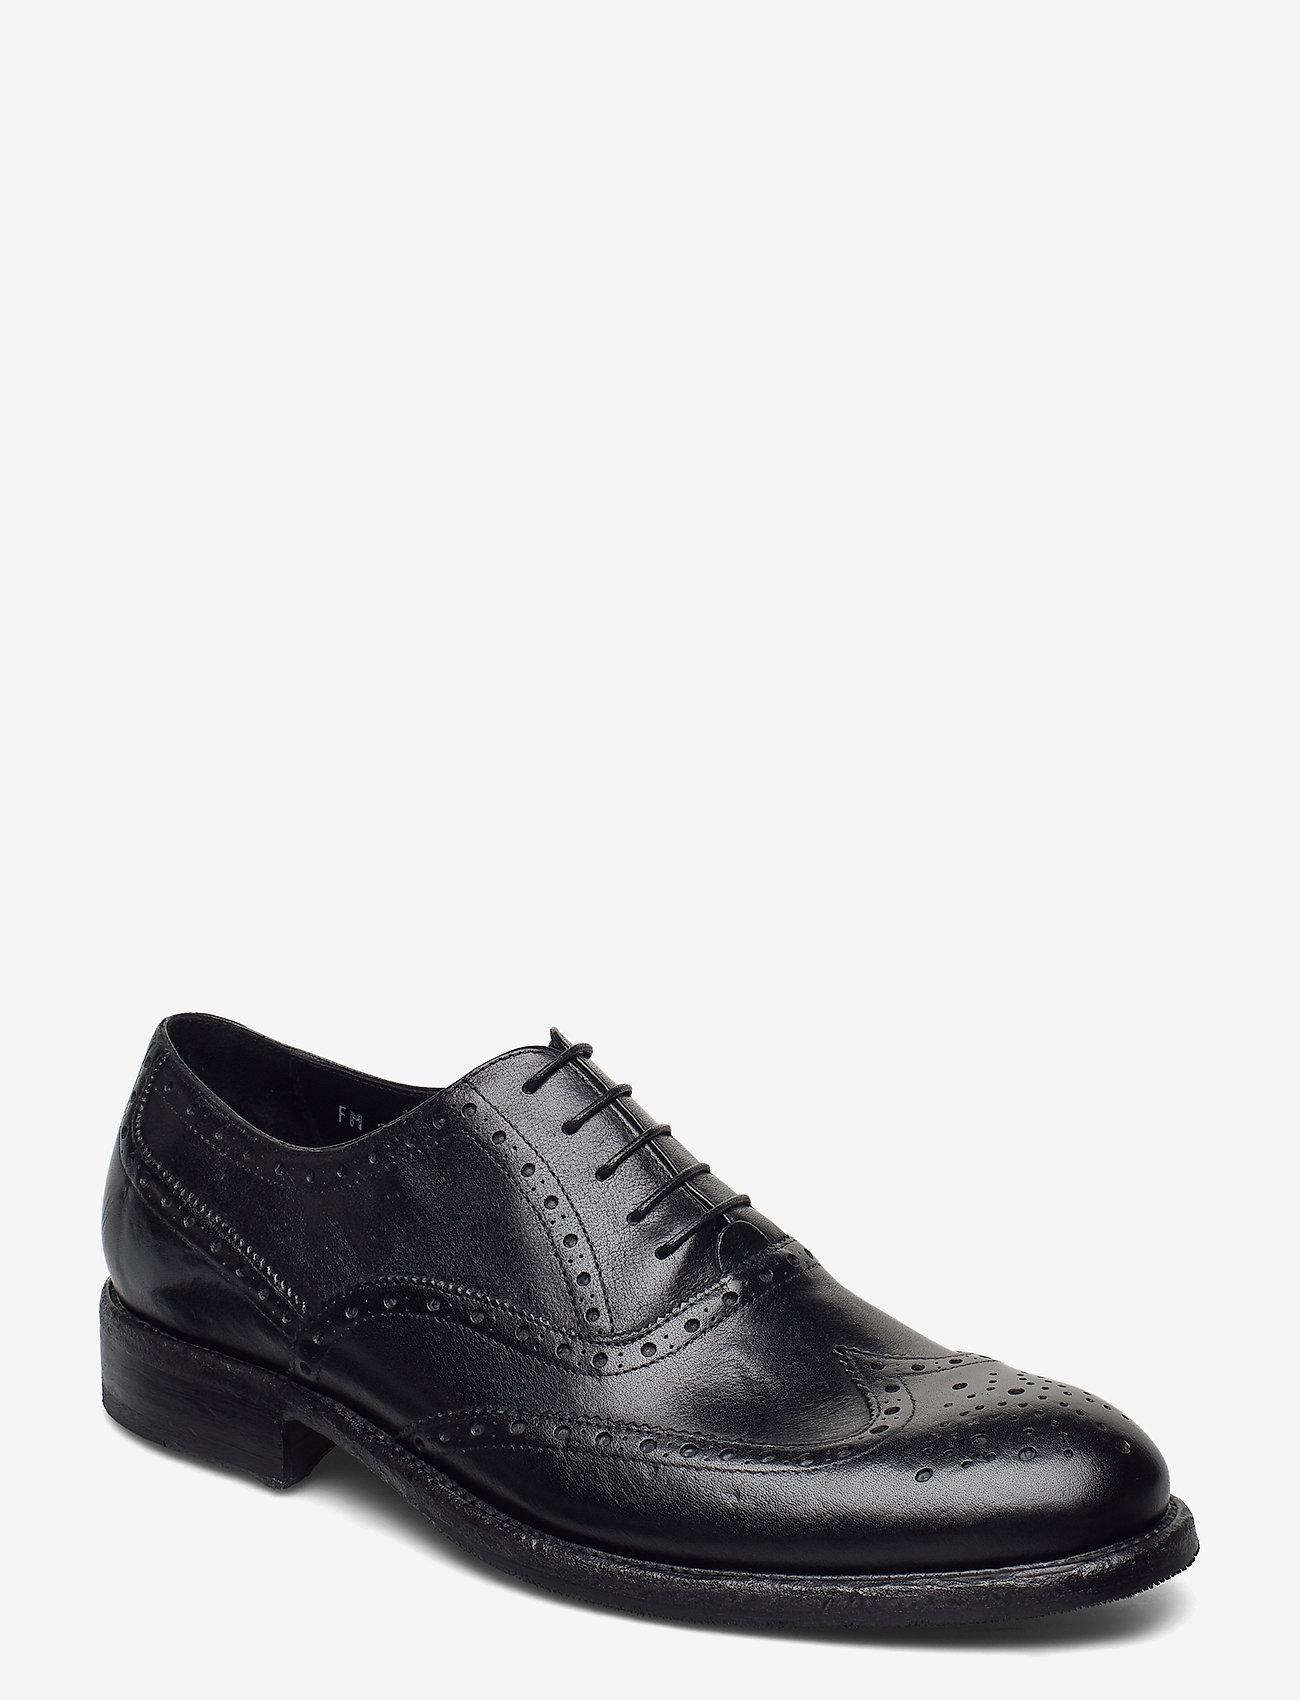 SAND - Footwear MW - F316 - snörskor - black - 0